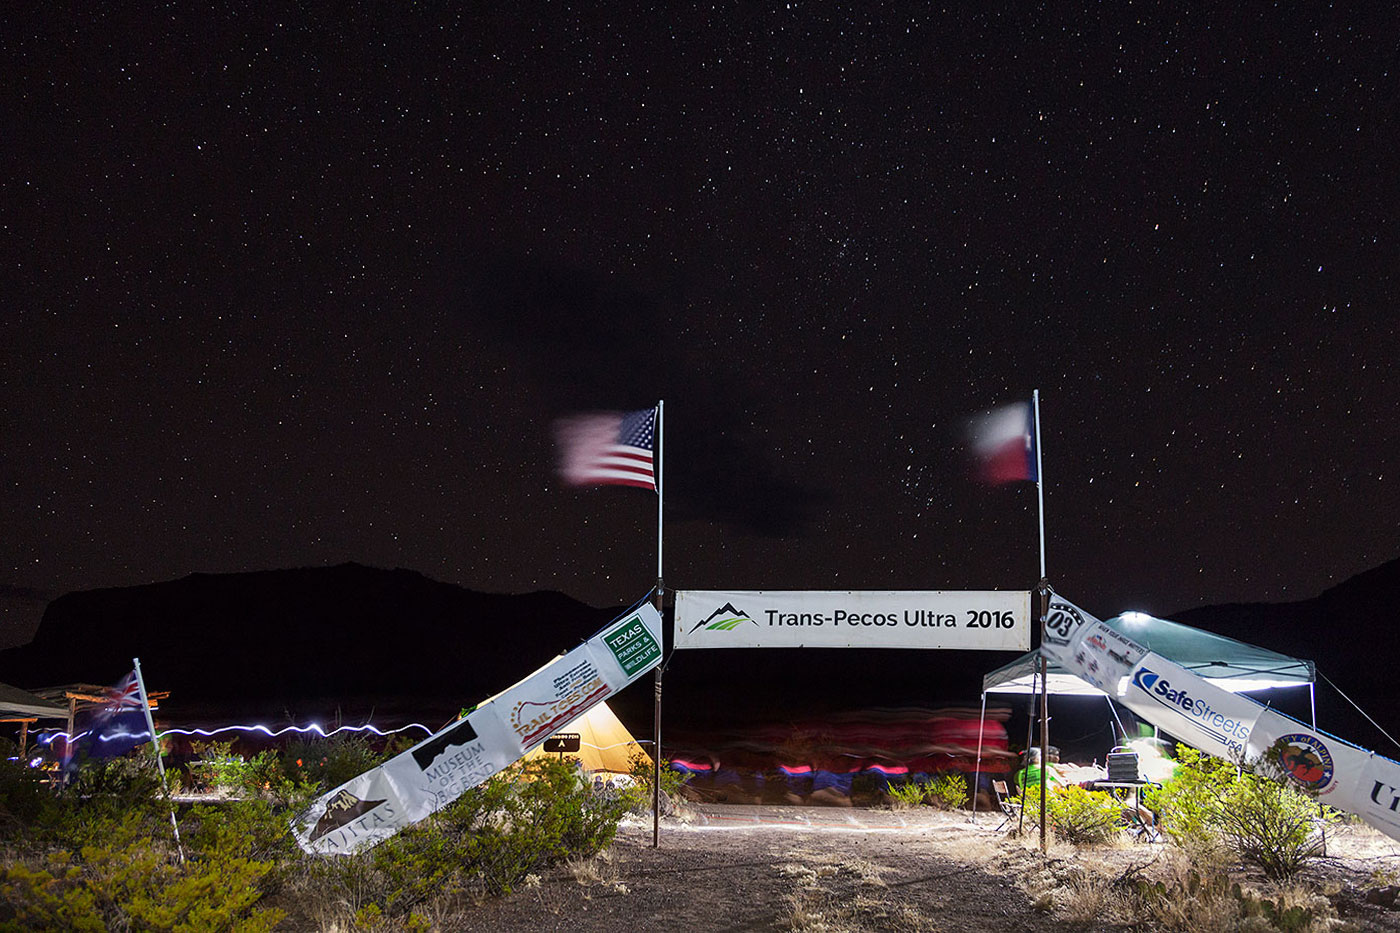 Trans-Pecos-Ultra-ABP-Stars_Escondido-Pens.jpg